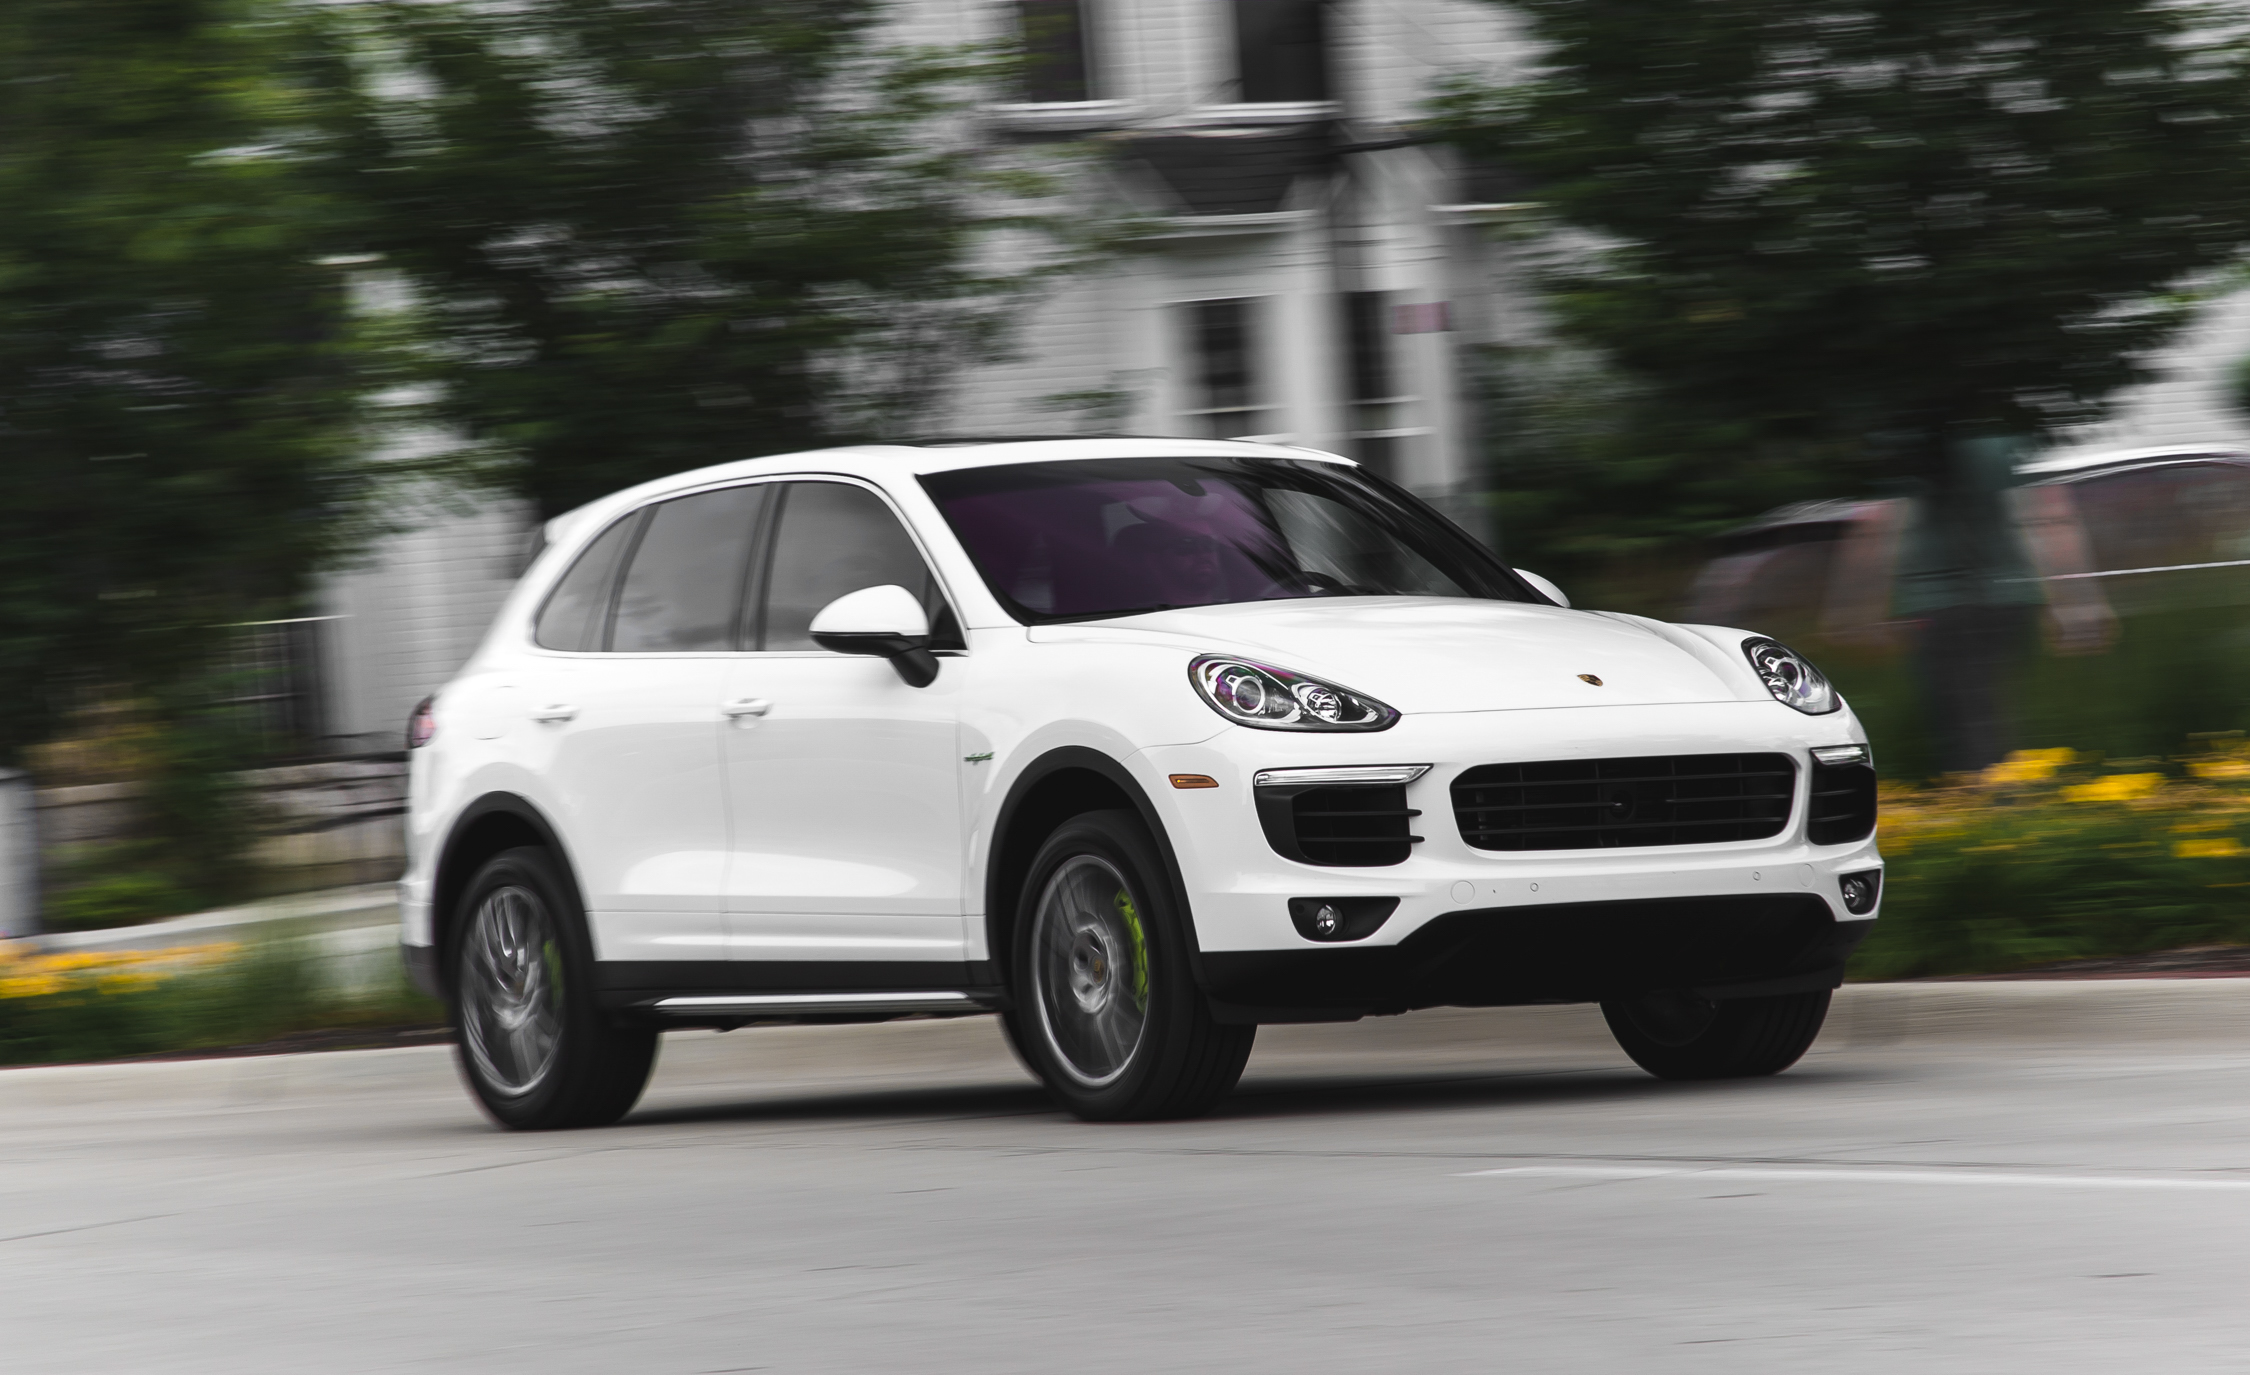 New 2015 Porsche Cayenne S E-Hybrid